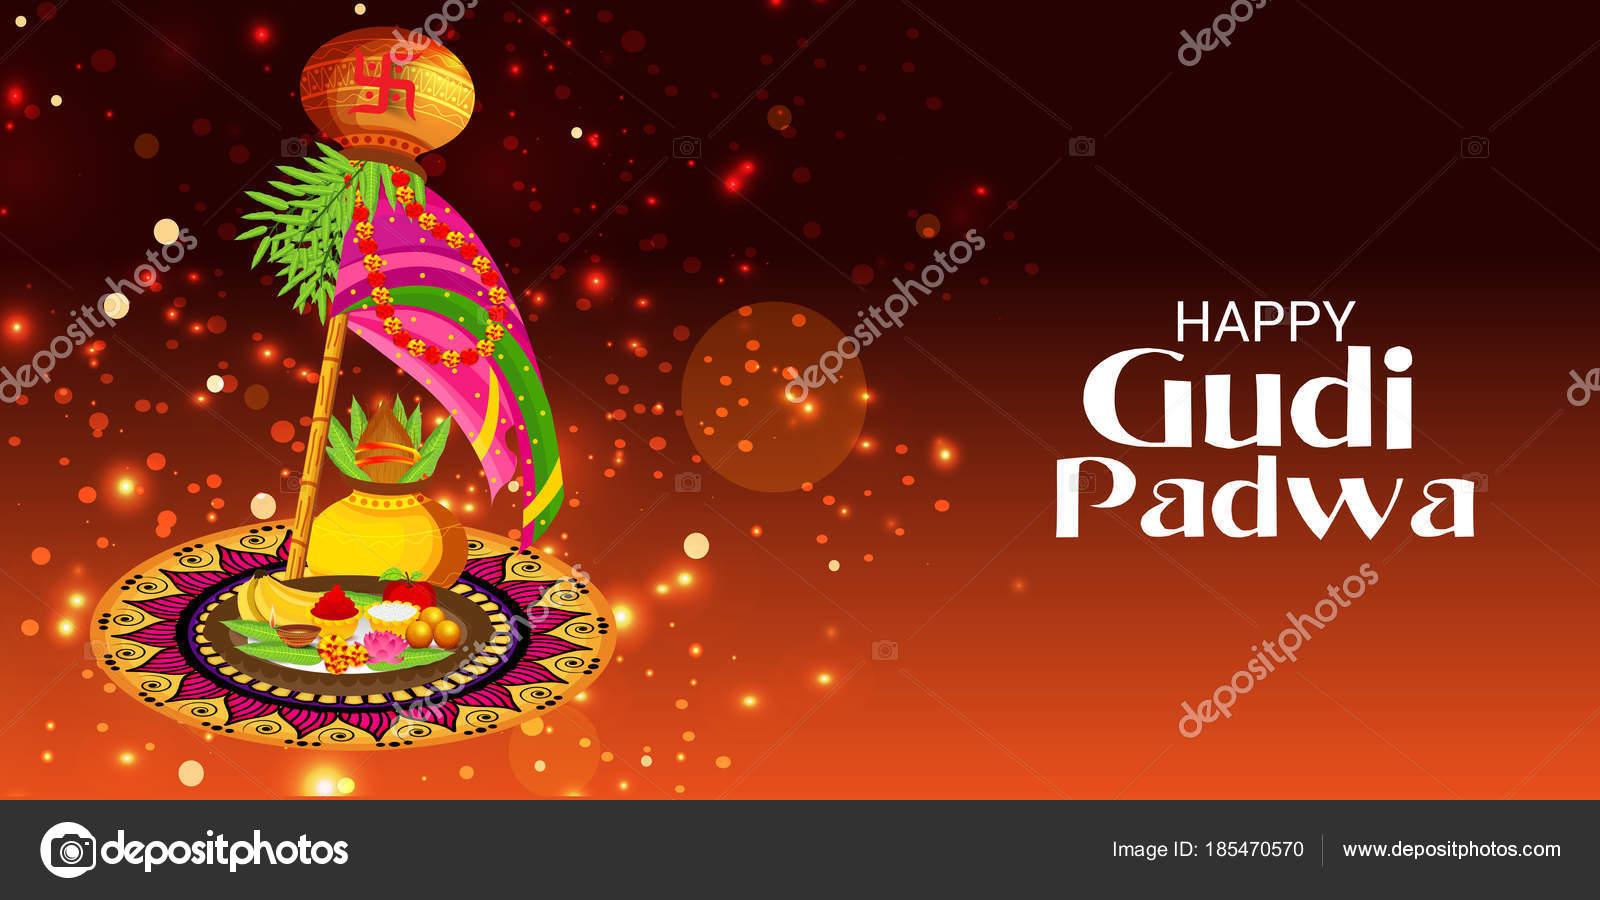 Illustration Background Happy Gudi Padwa Marathi New Year Stock